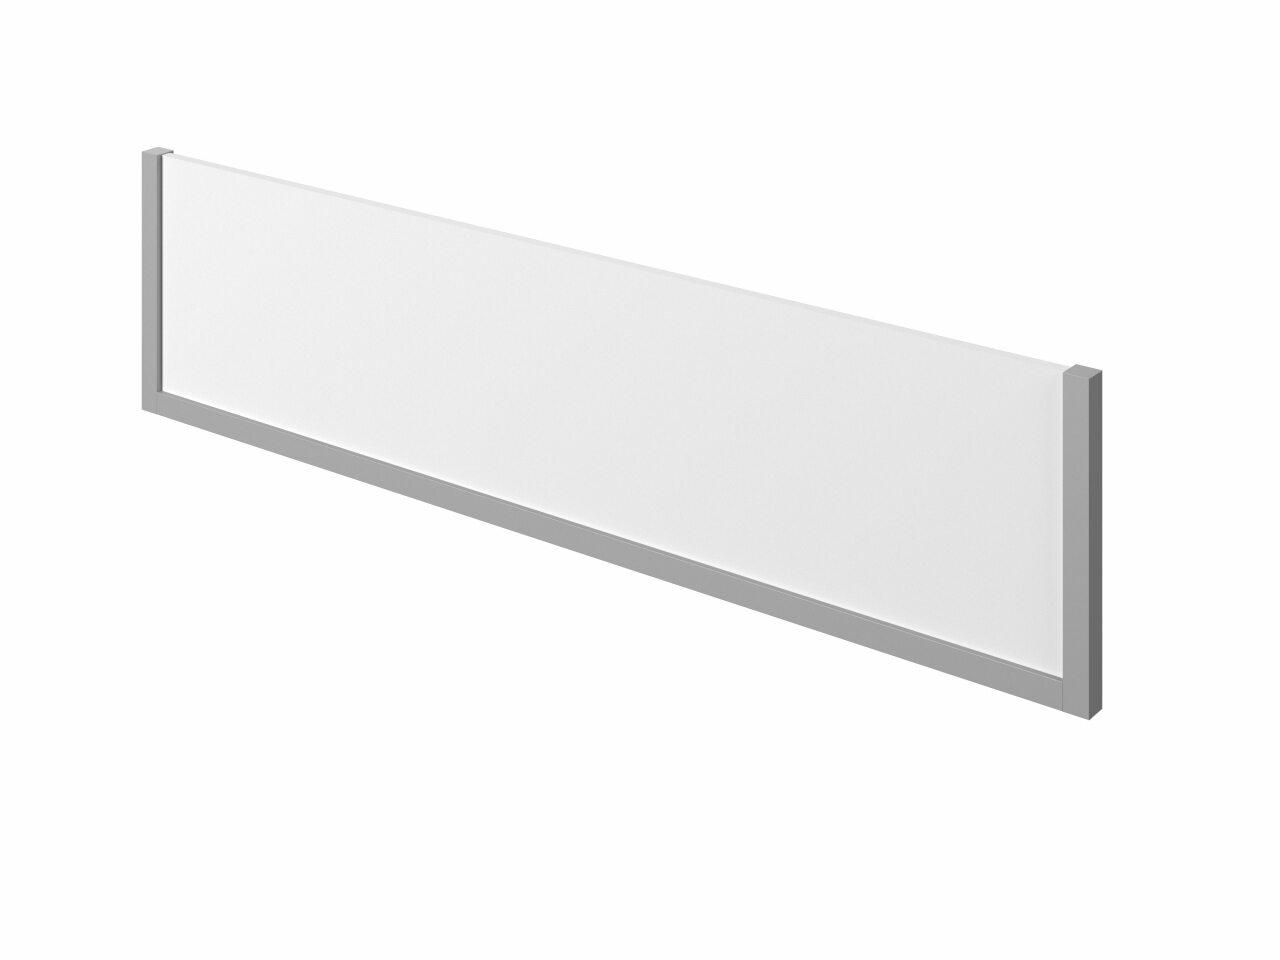 Экран ЛДСП с декоративными элементам  Public Comfort 150x4x37 - фото 6